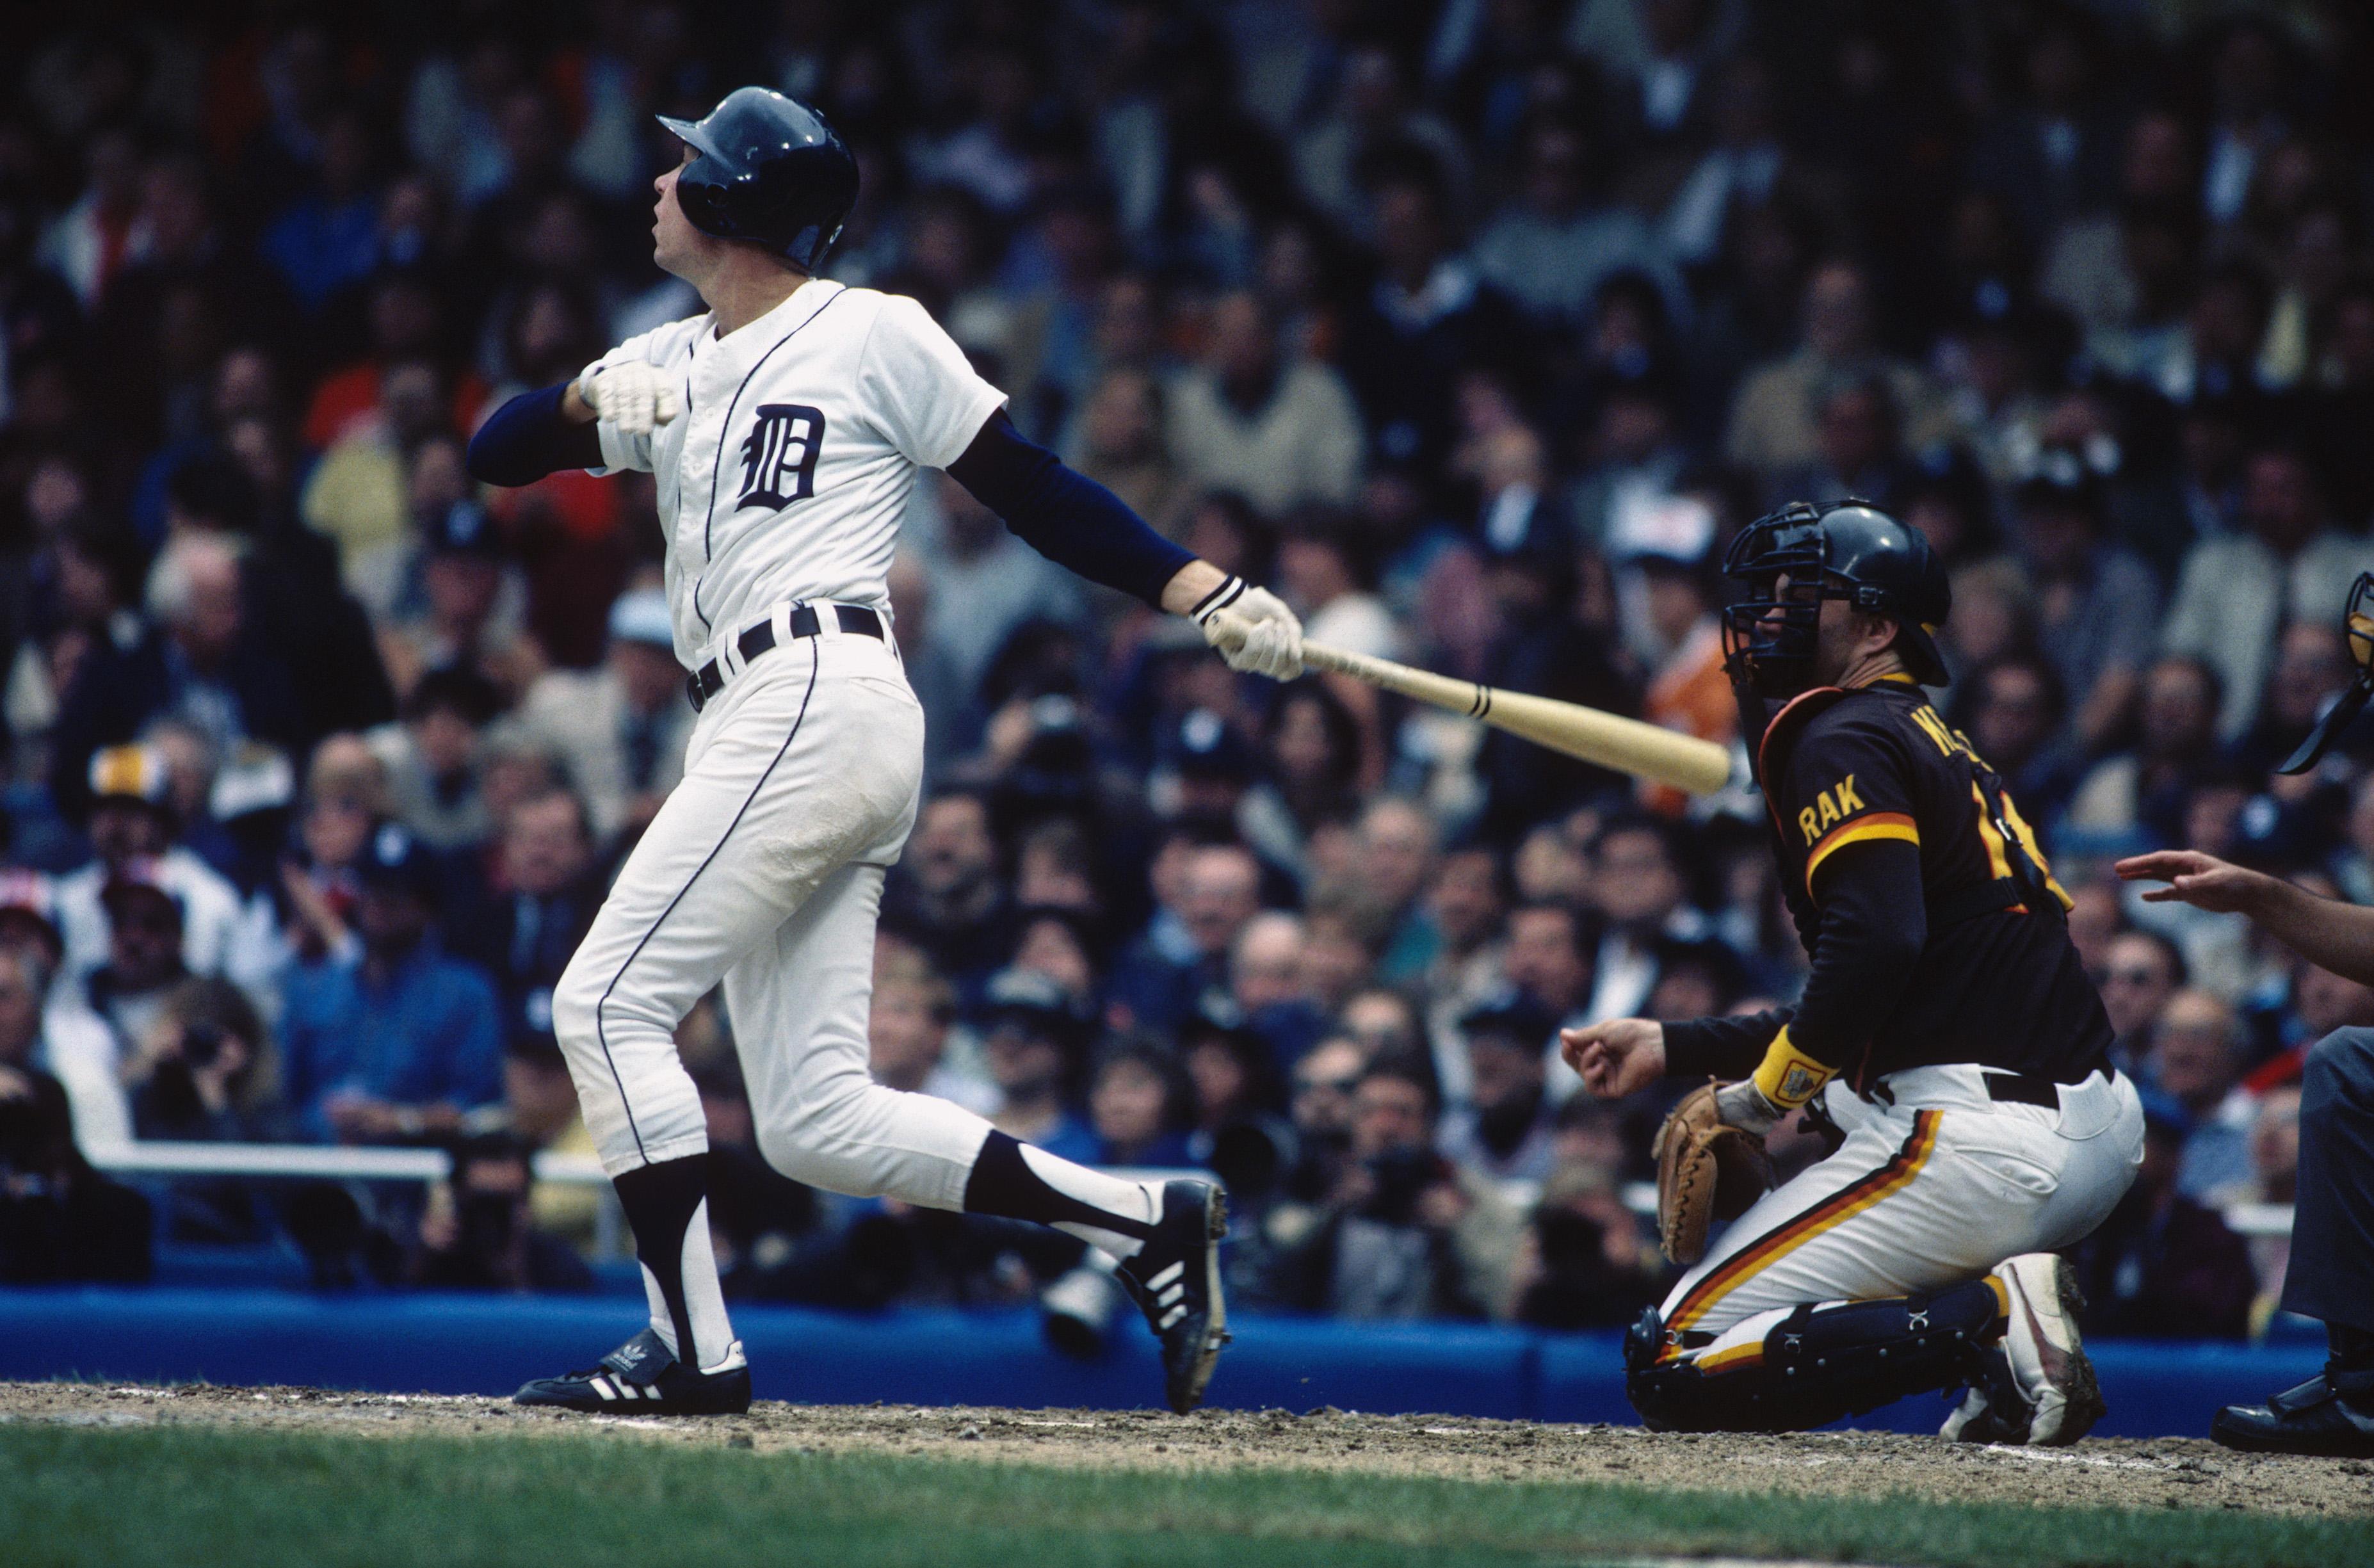 1984 World Series - Tigers v Padres